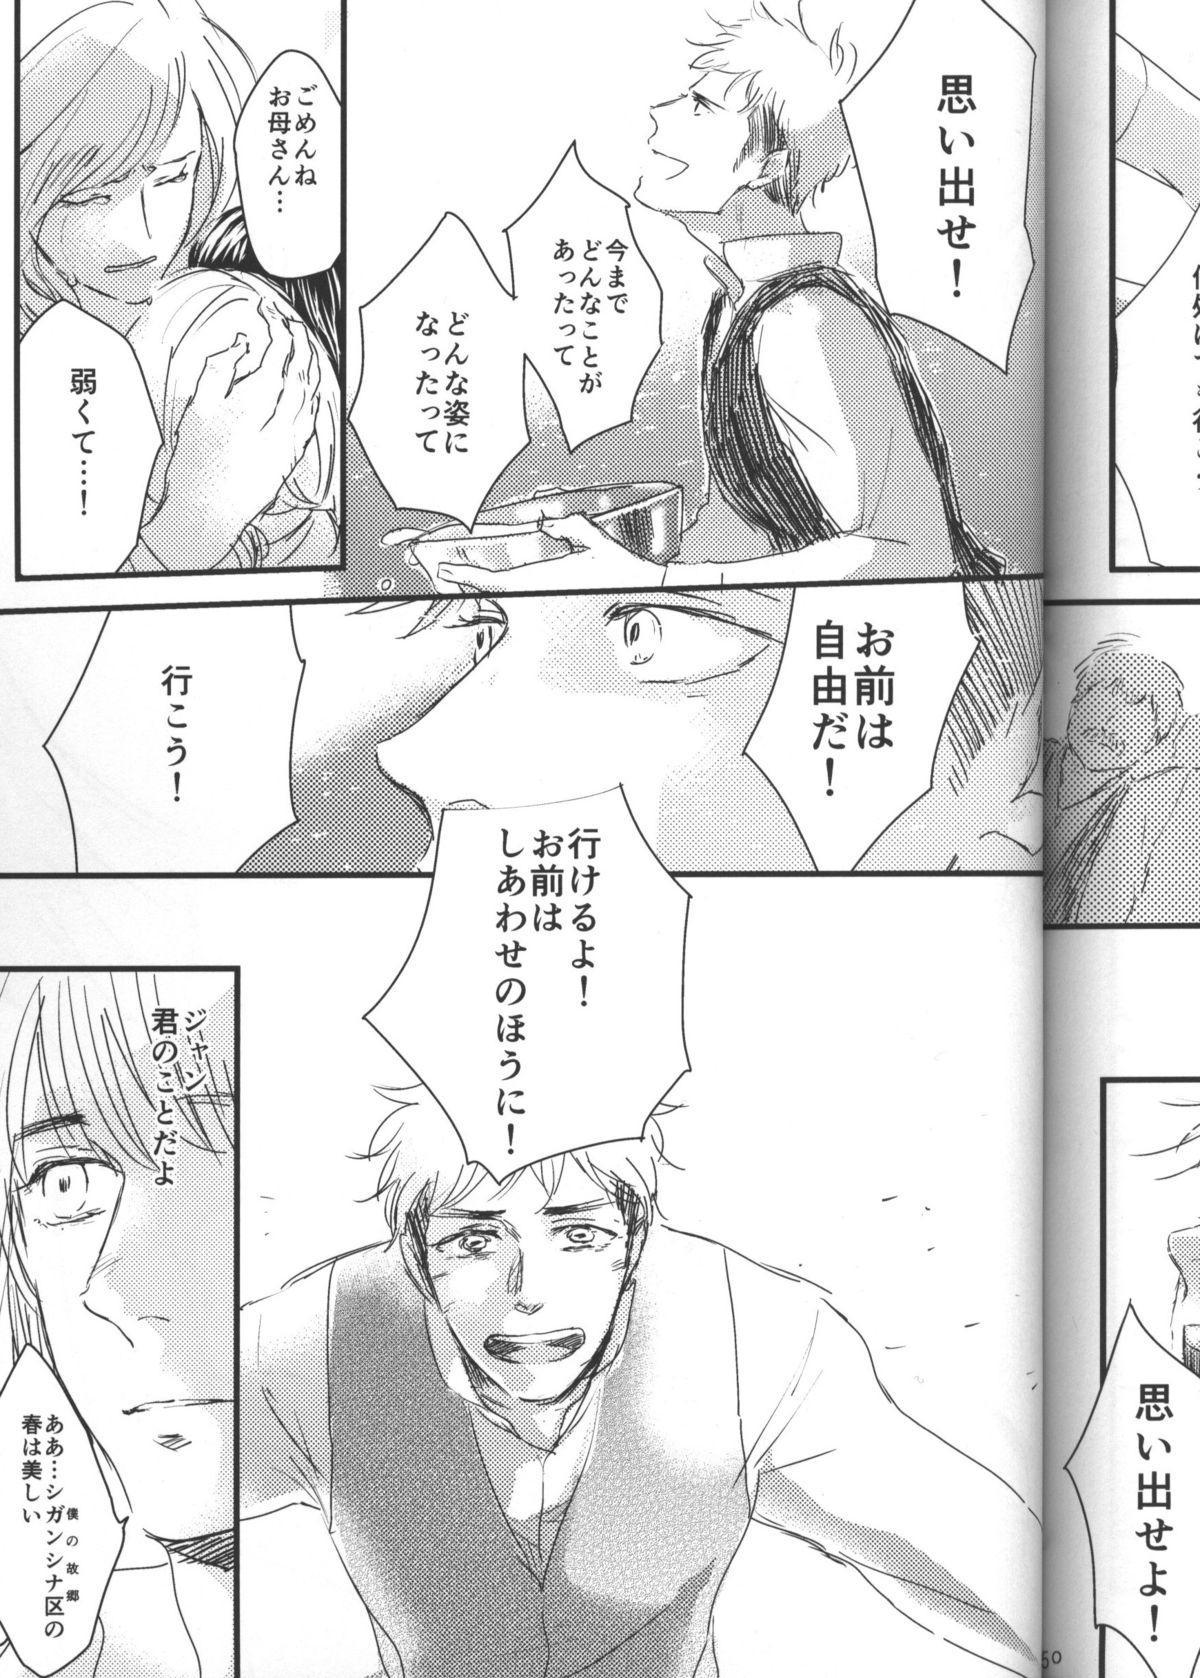 Hirou Hito 51